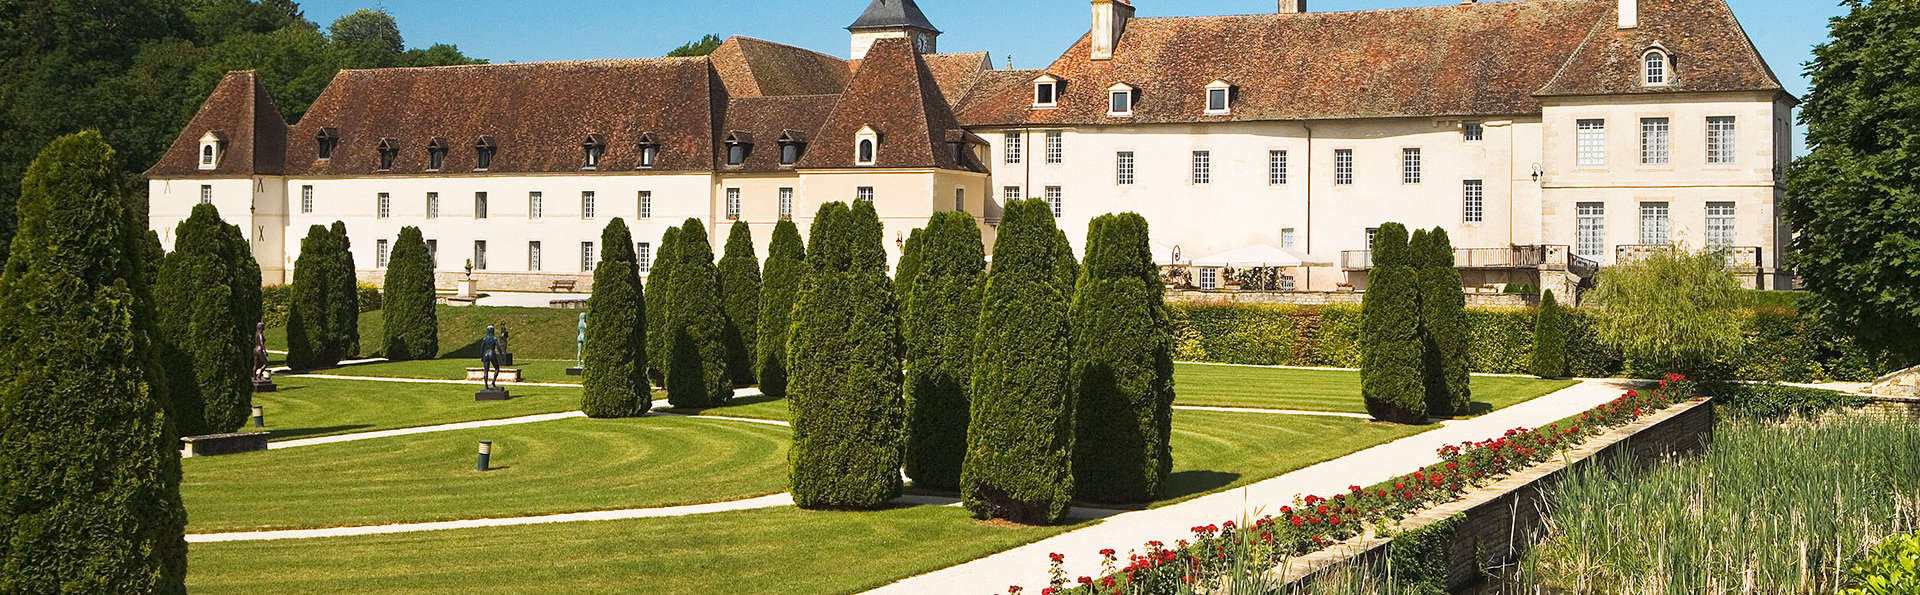 Château de Gilly - EDIT_front2.jpg